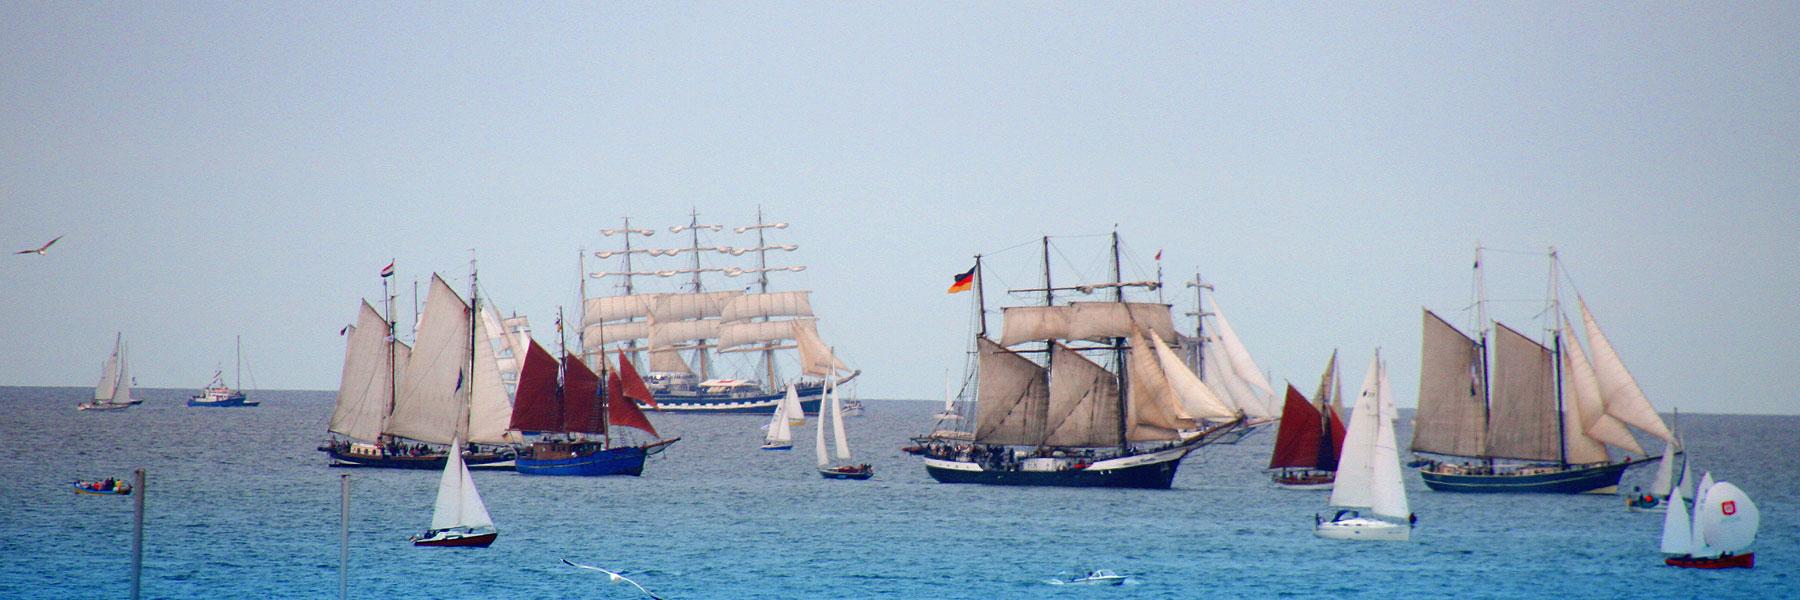 Schiffe - Pensionszimmer Nordstern